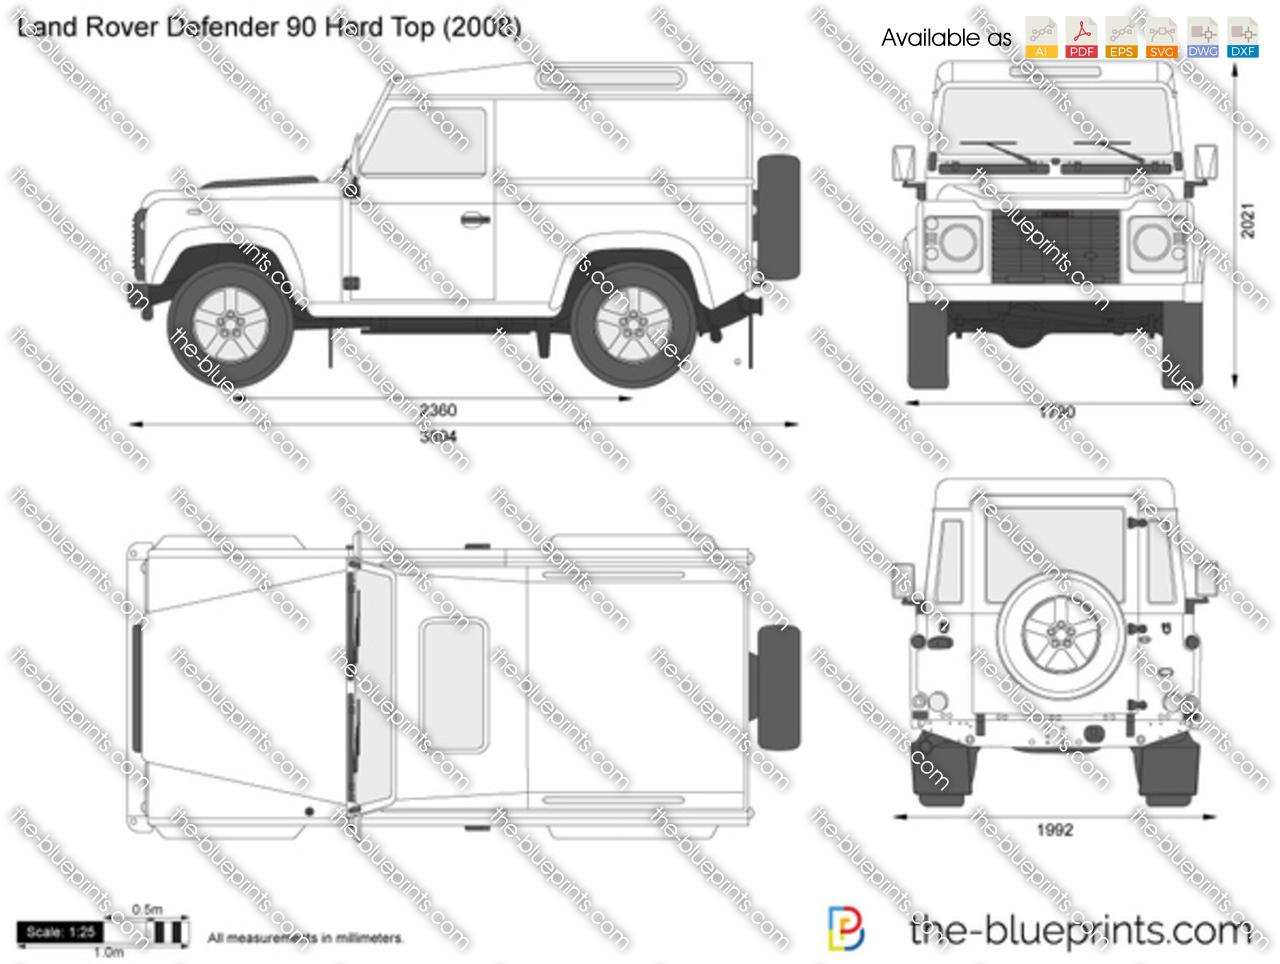 Land Rover Defender 90 Hard Top vector drawing